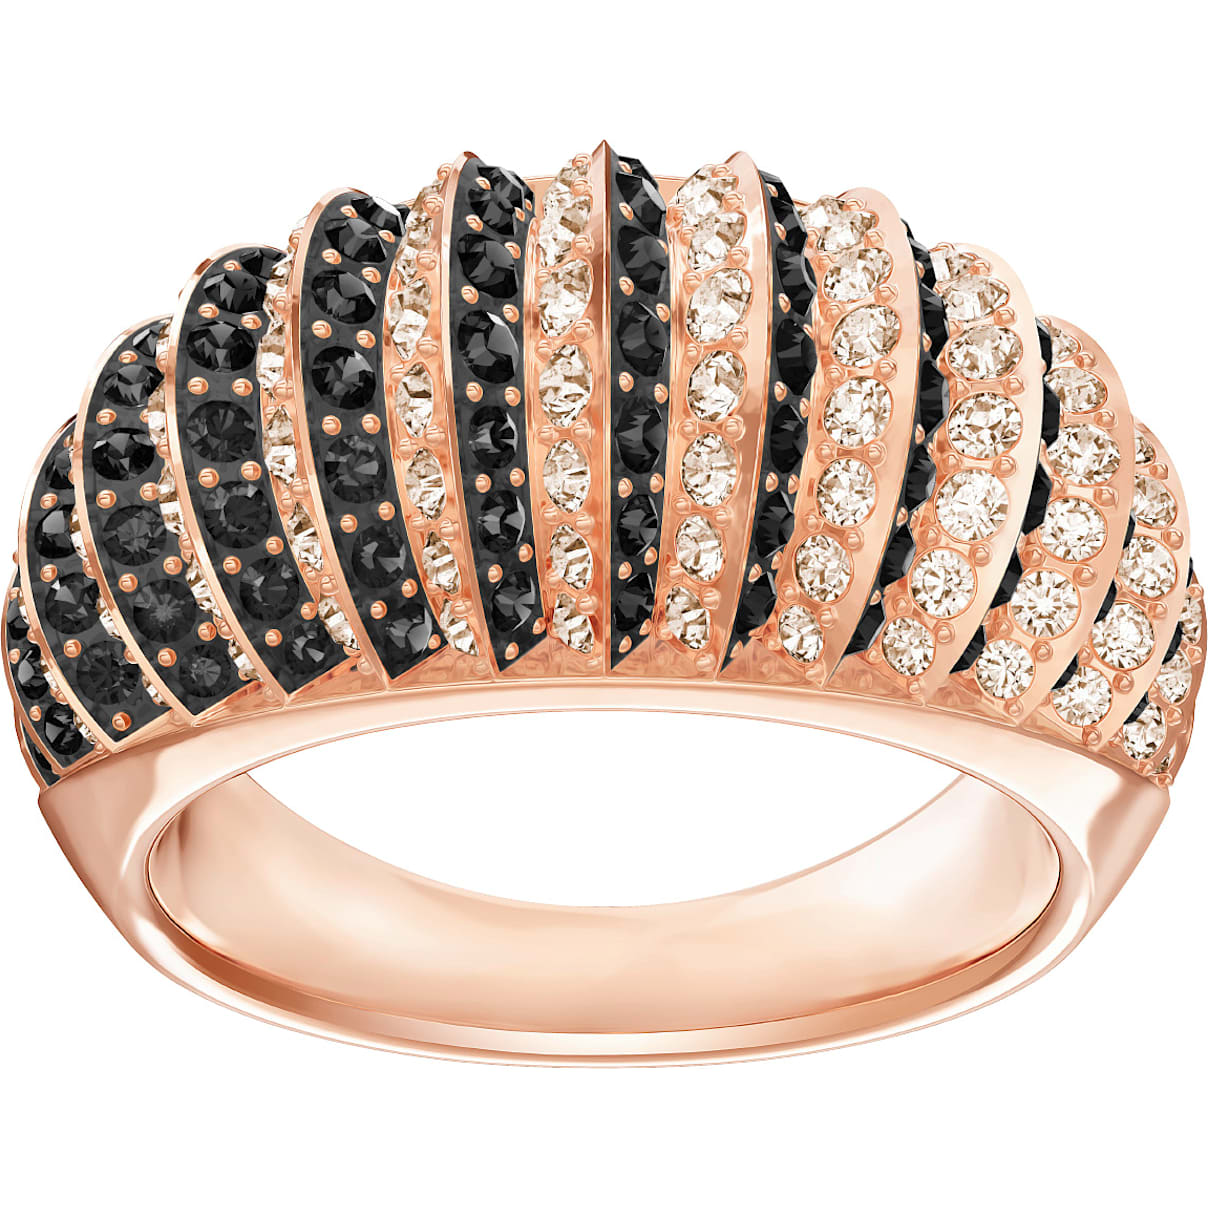 Swarovski Luxury Domed Ring, Black, Rose-gold tone plated